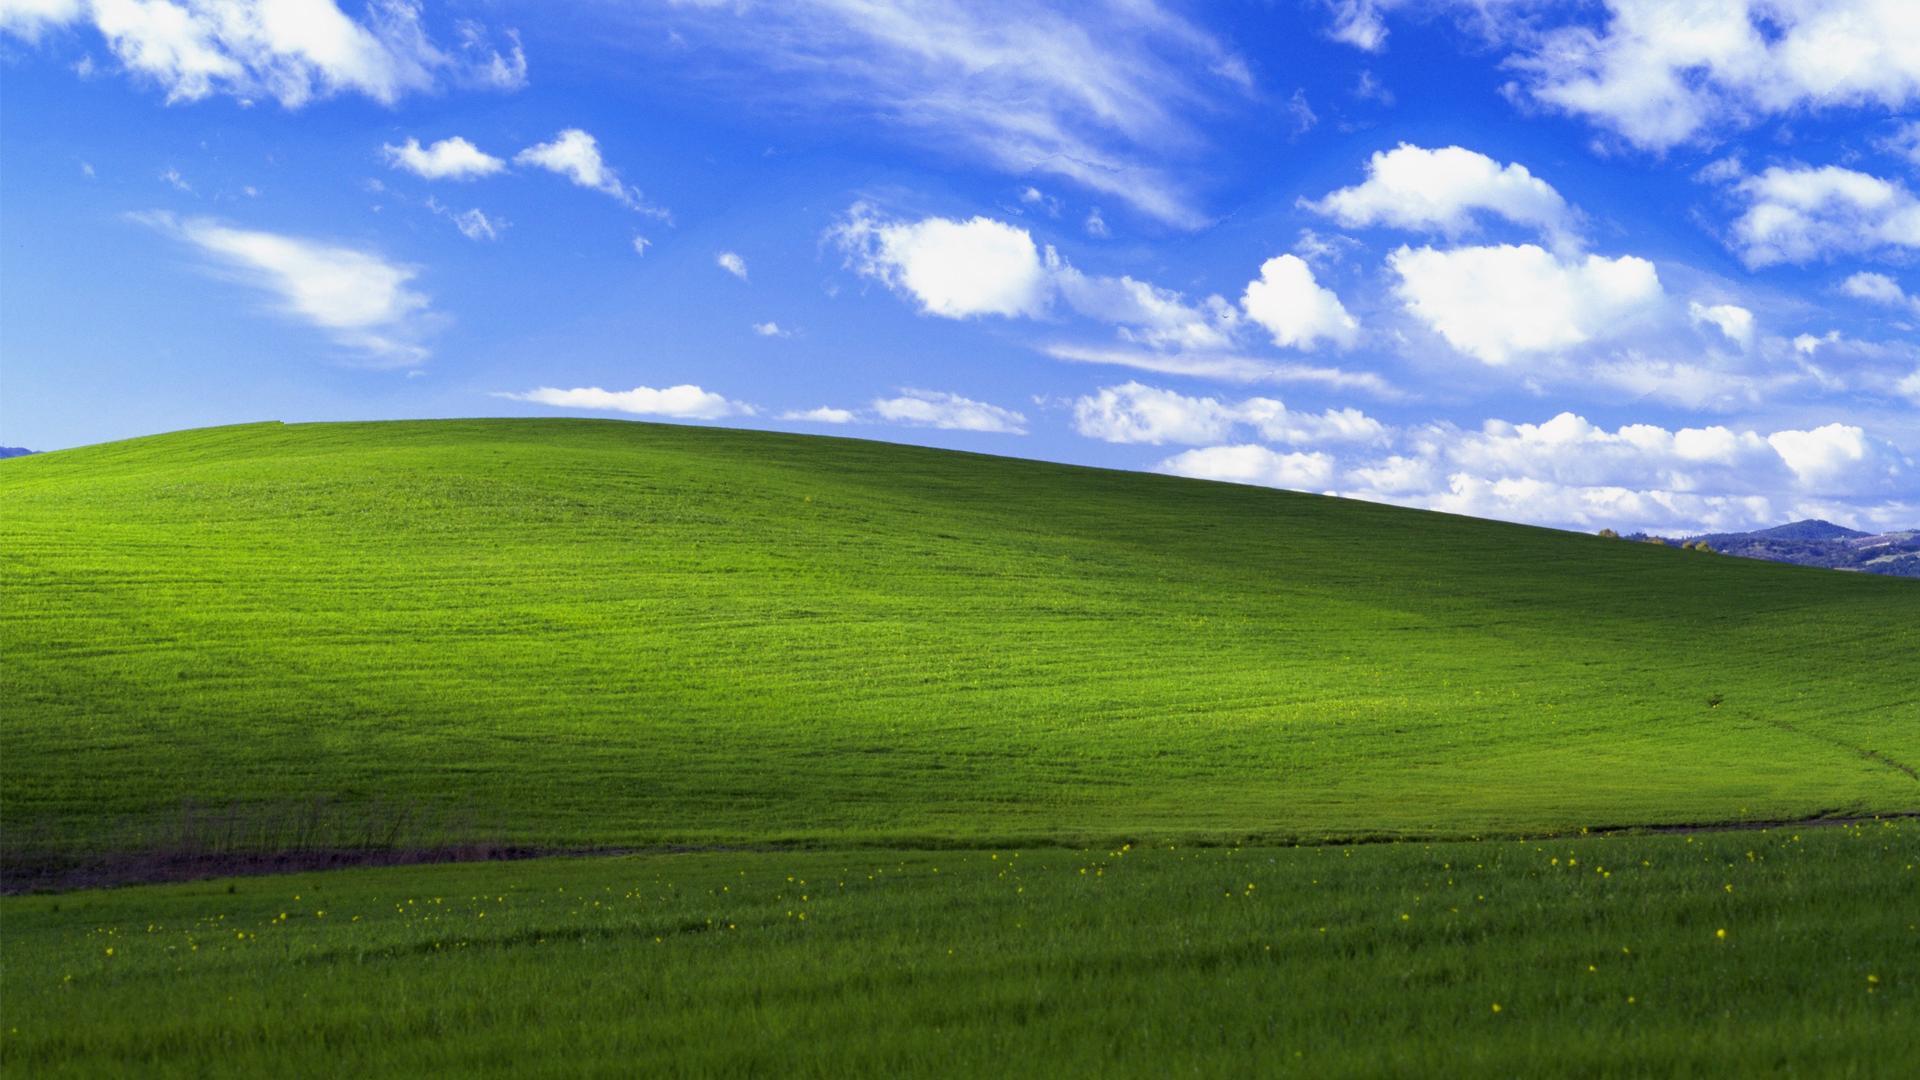 76 Windows Xp Wallpaper On Wallpapersafari